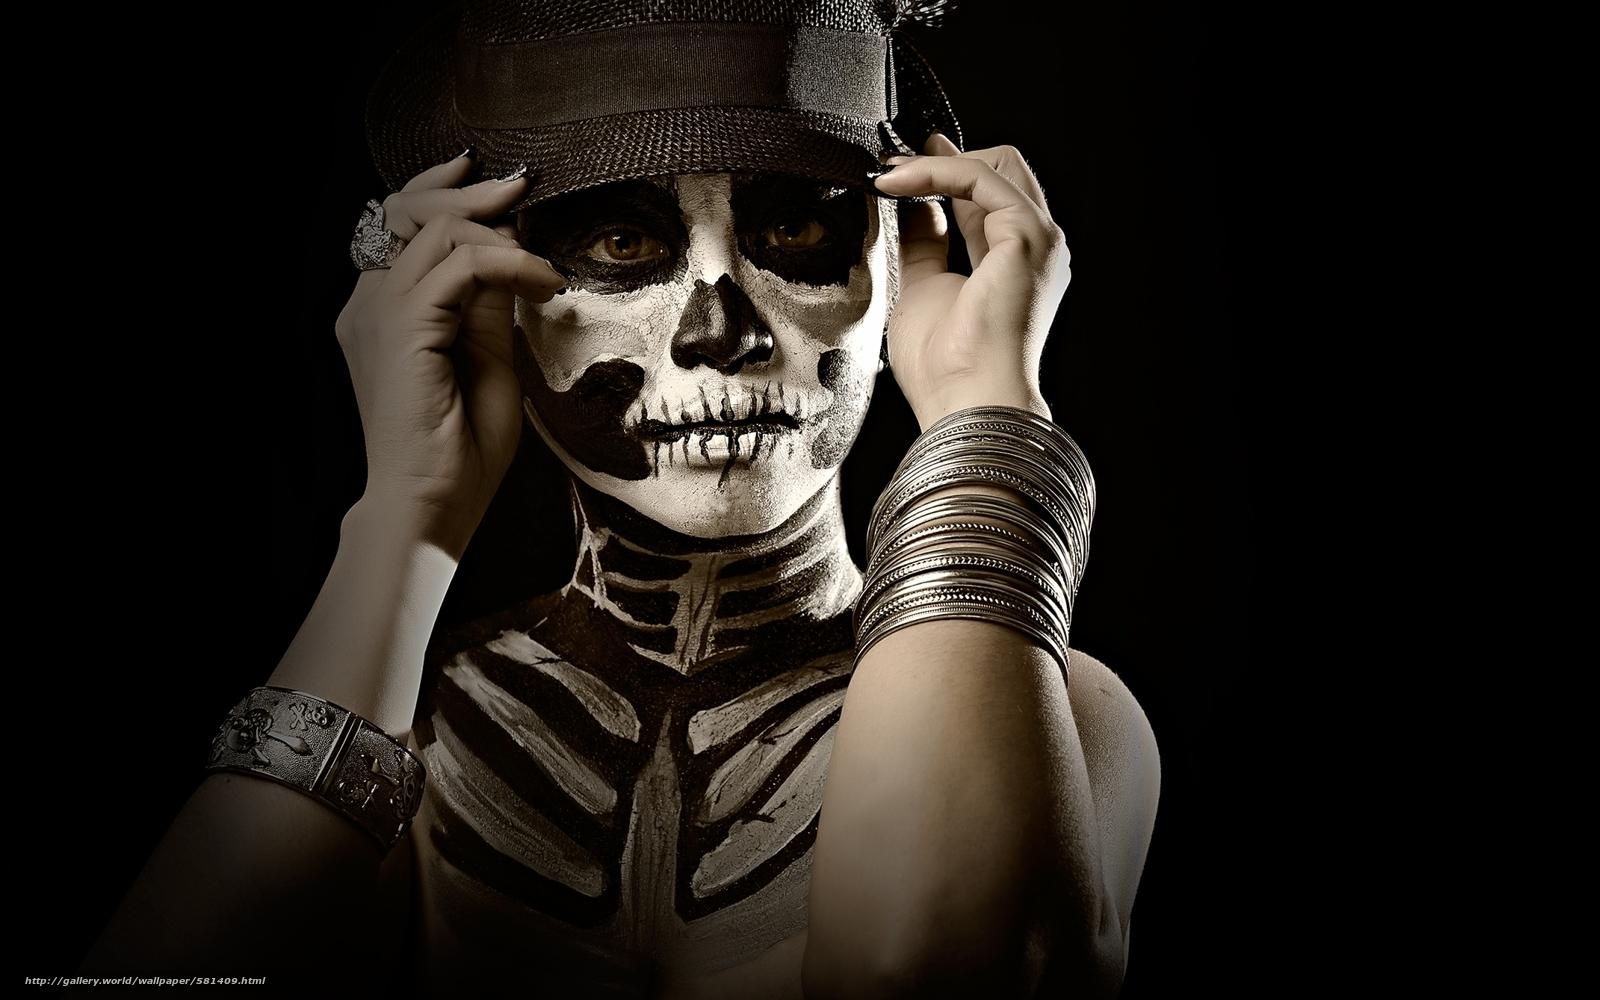 Tlcharger fond d 39 ecran style maquillage fille masque for Fond decran styler